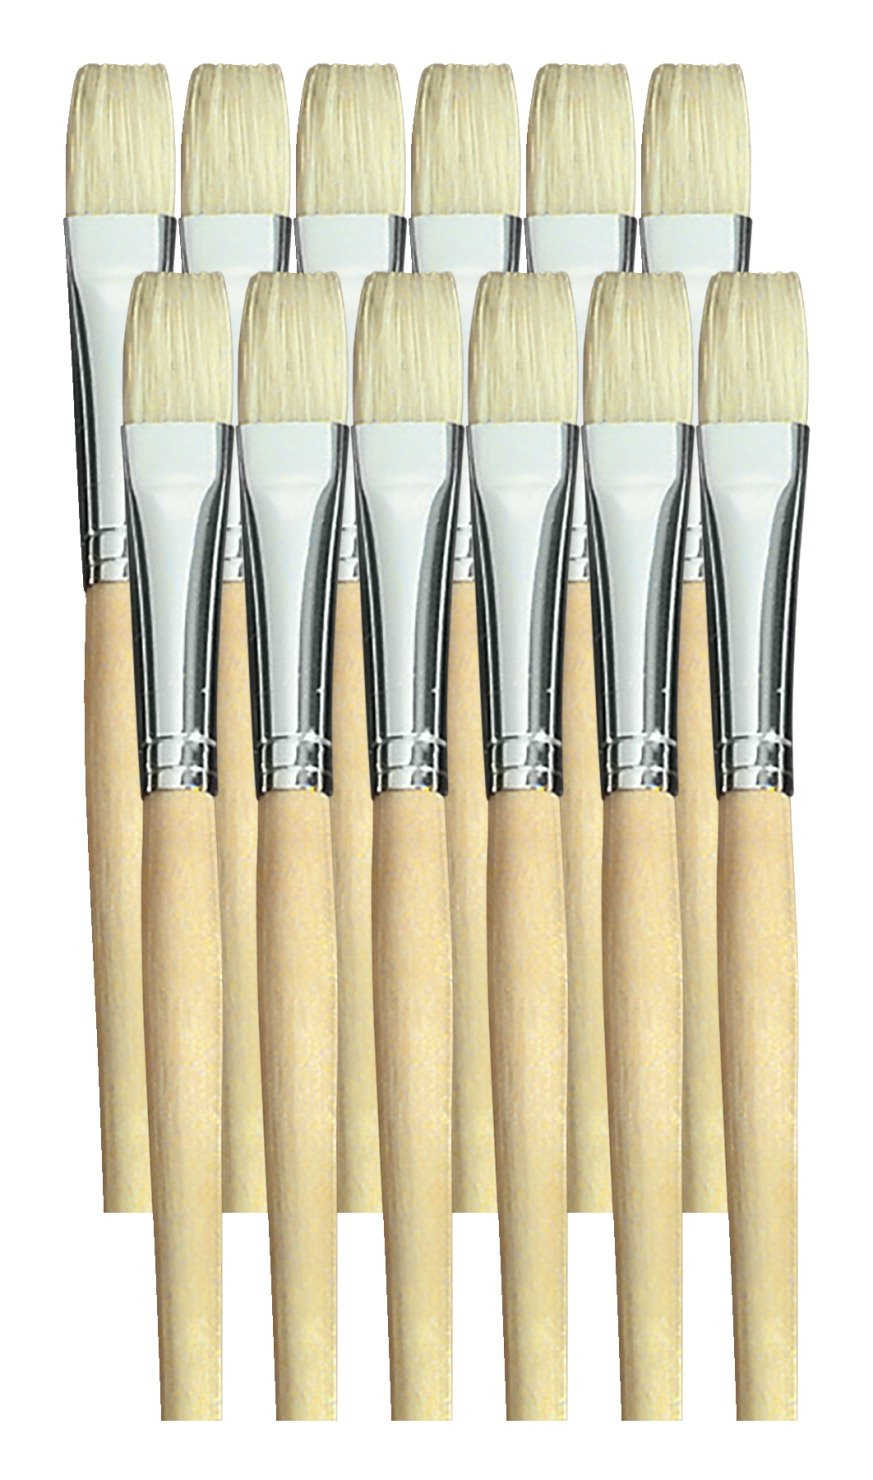 School Smart White Bristle Short Handle Paint Brush, 1/2 inch, Pack of 12